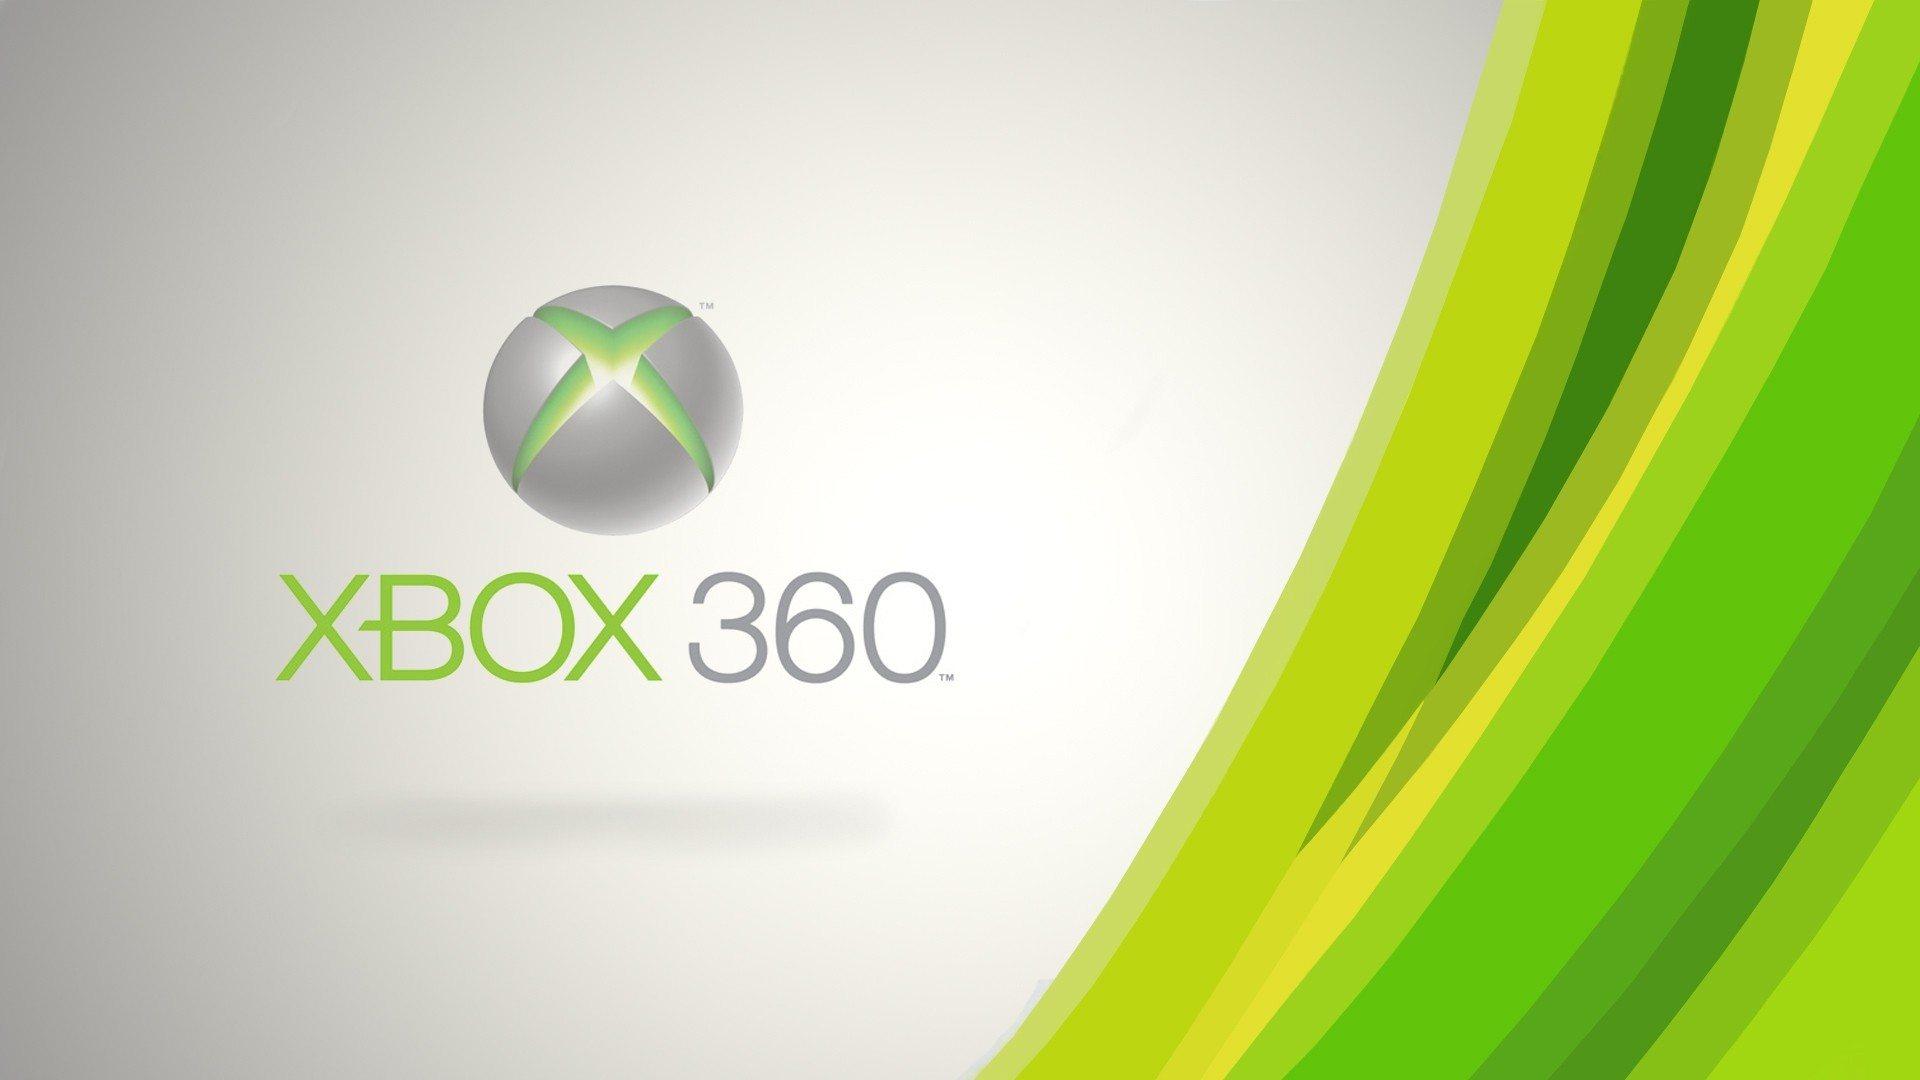 Xbox 360 Wallpapers Hd wallpaper   929458 1920x1080